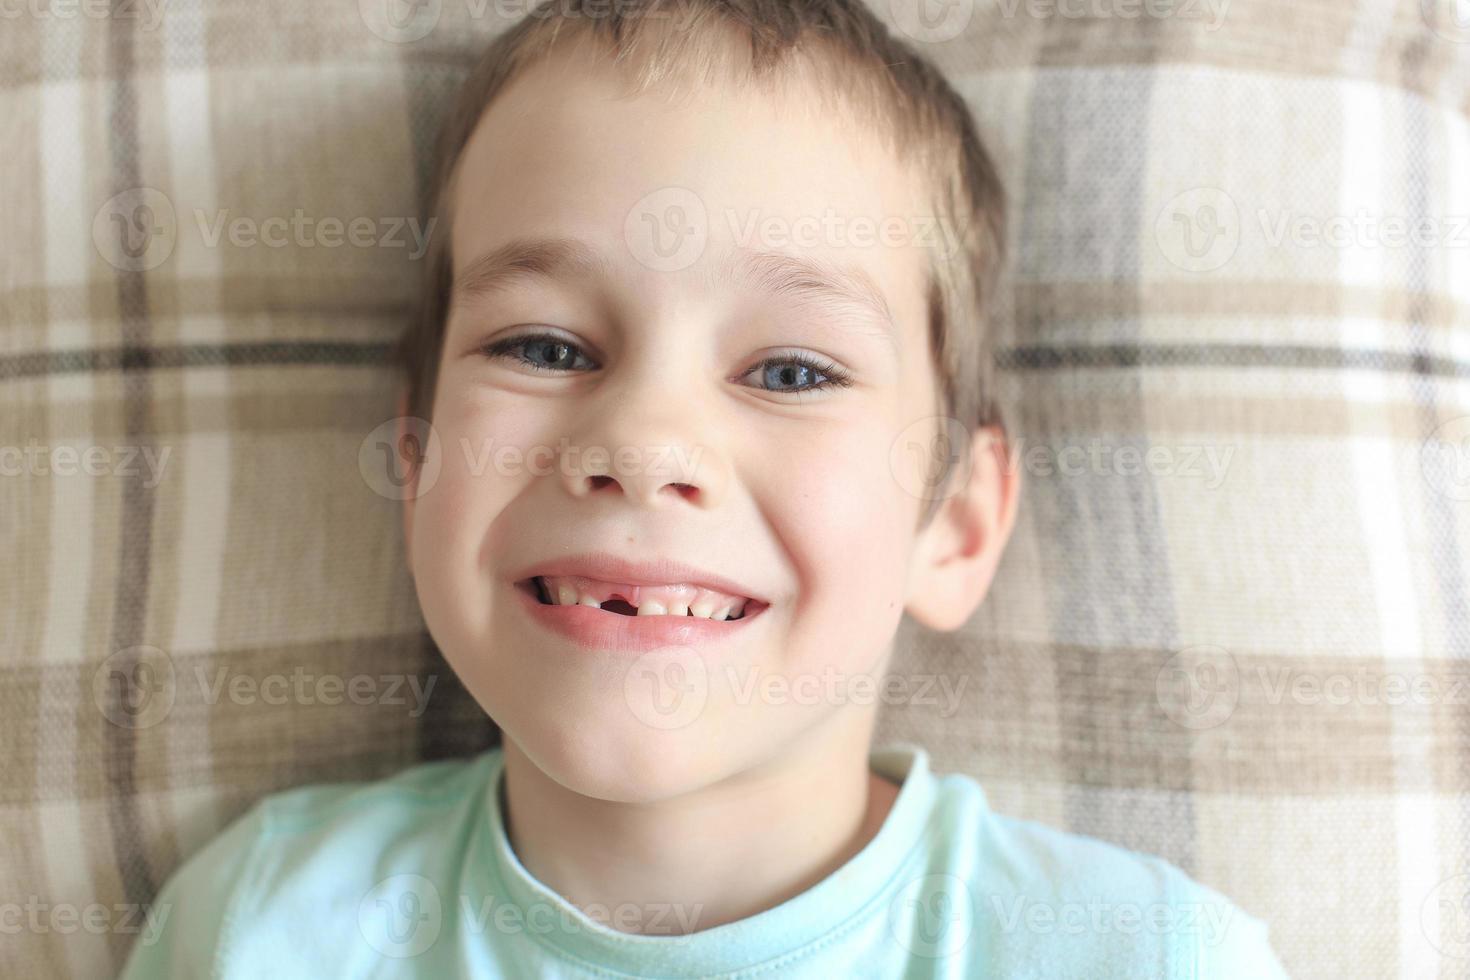 toothless smile photo